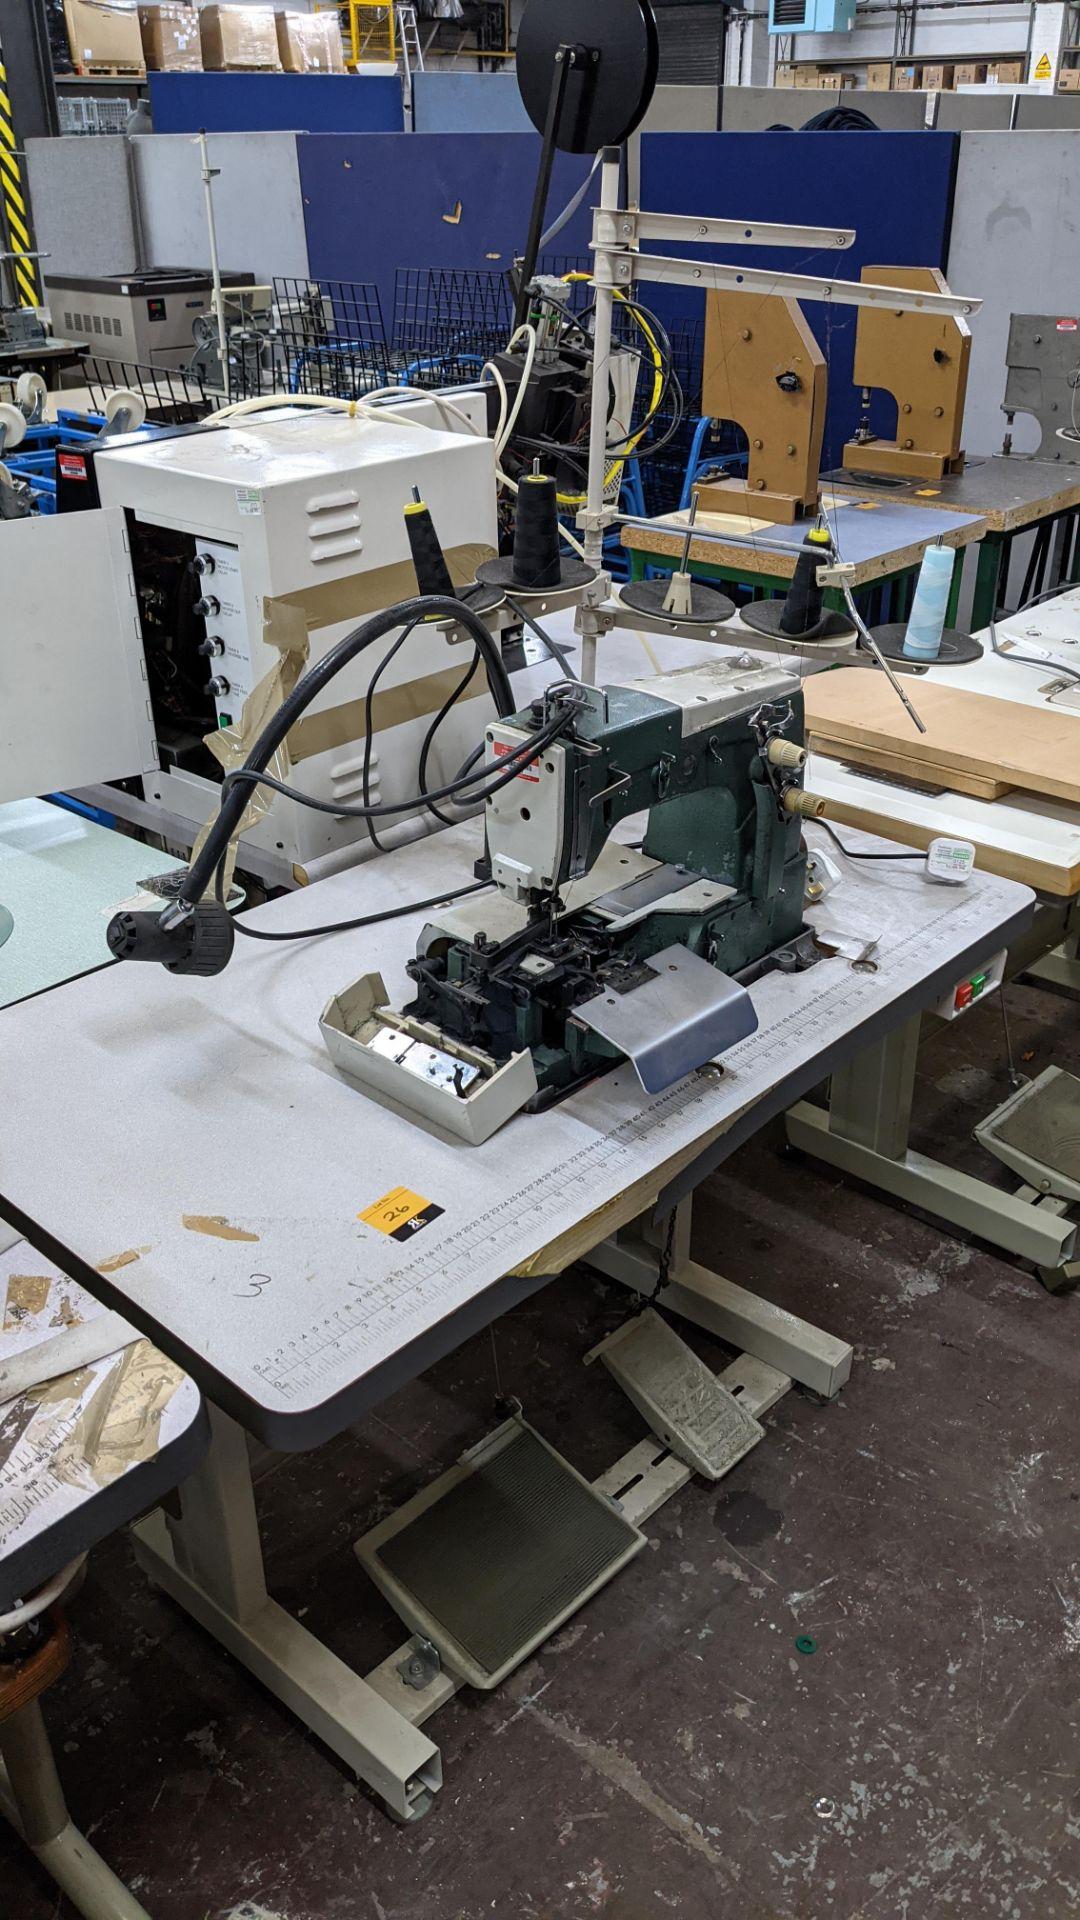 Sewing machine - Image 15 of 16